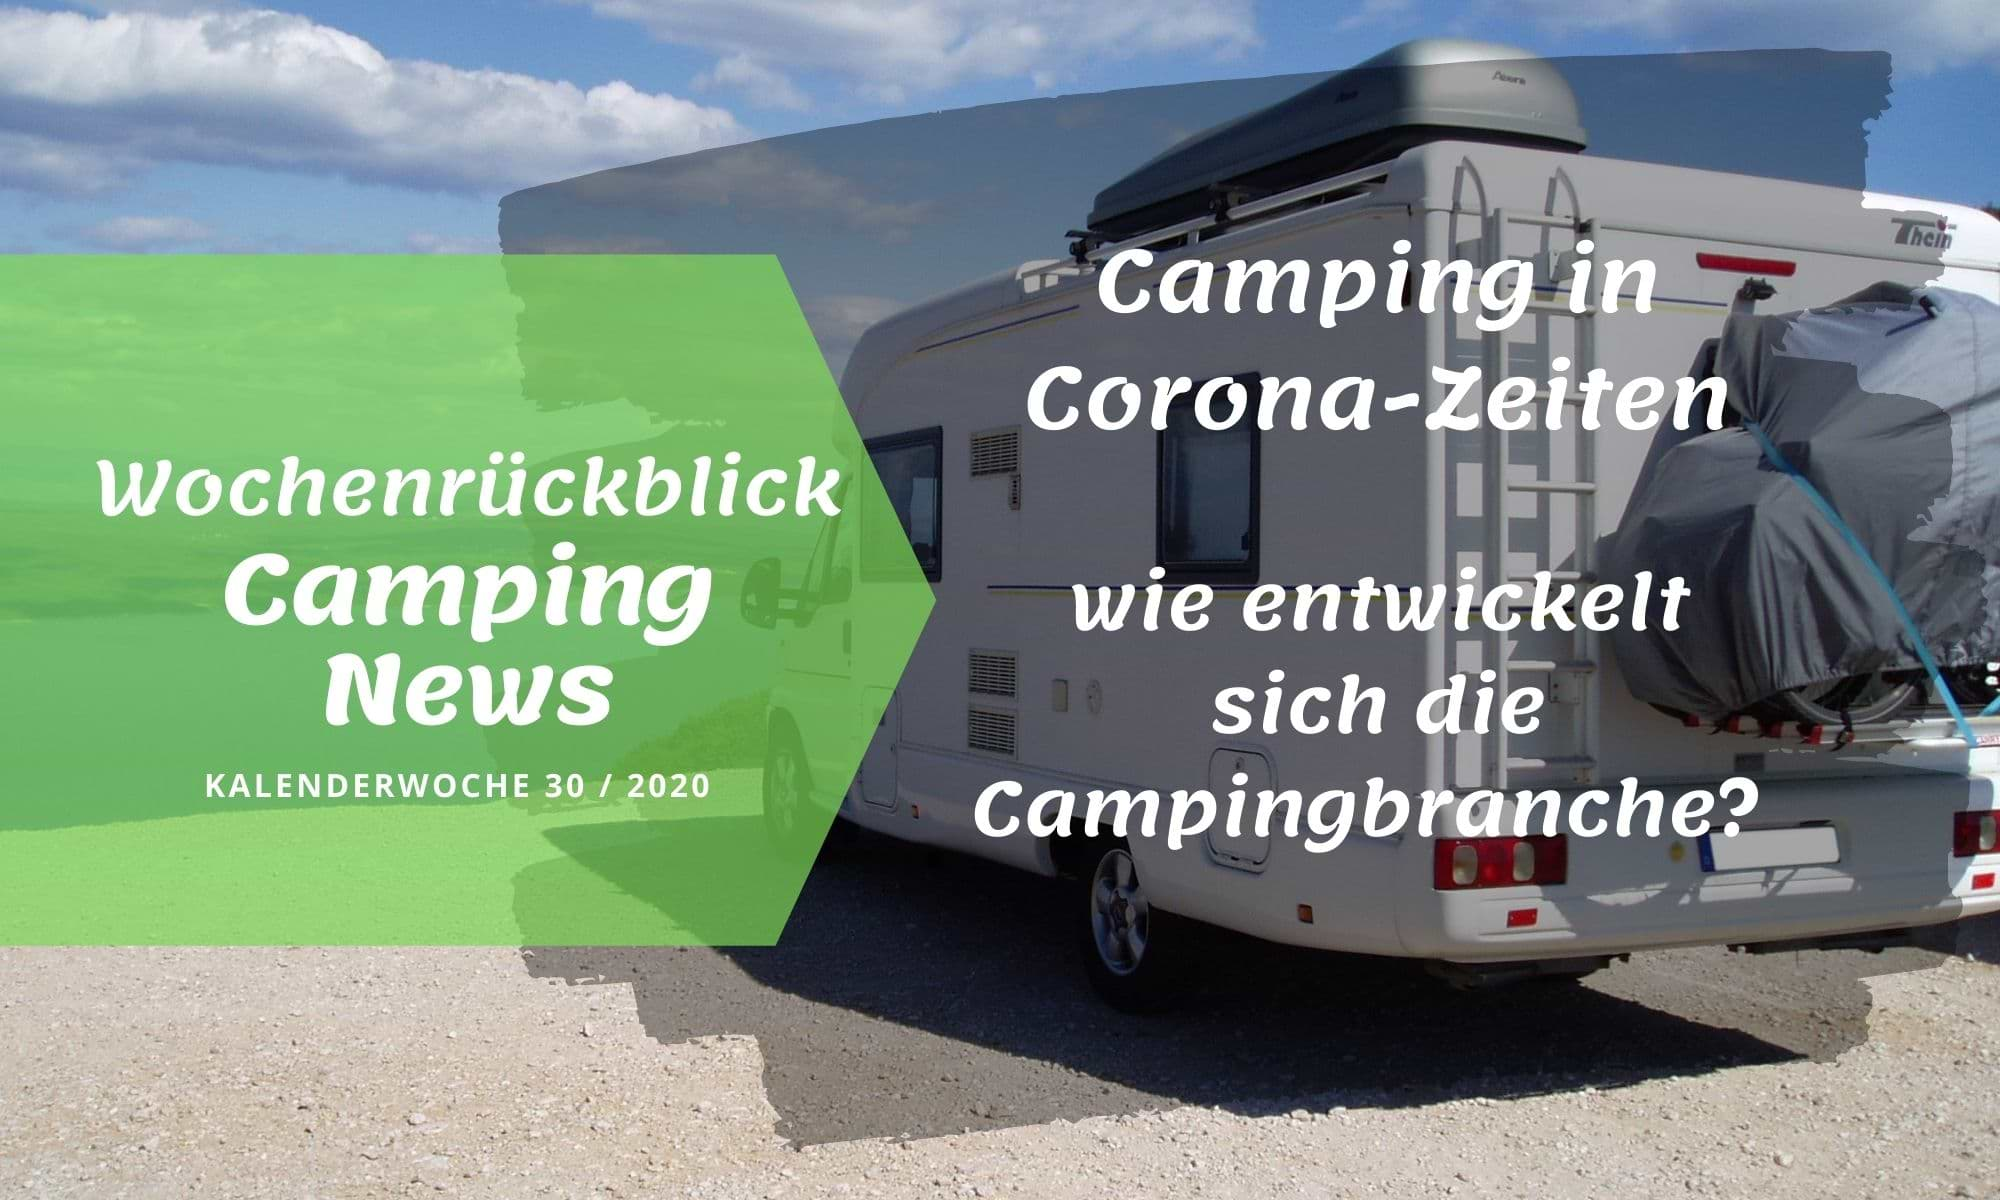 Wochenrückblick Camping News KW30-2020 Camping und Corona